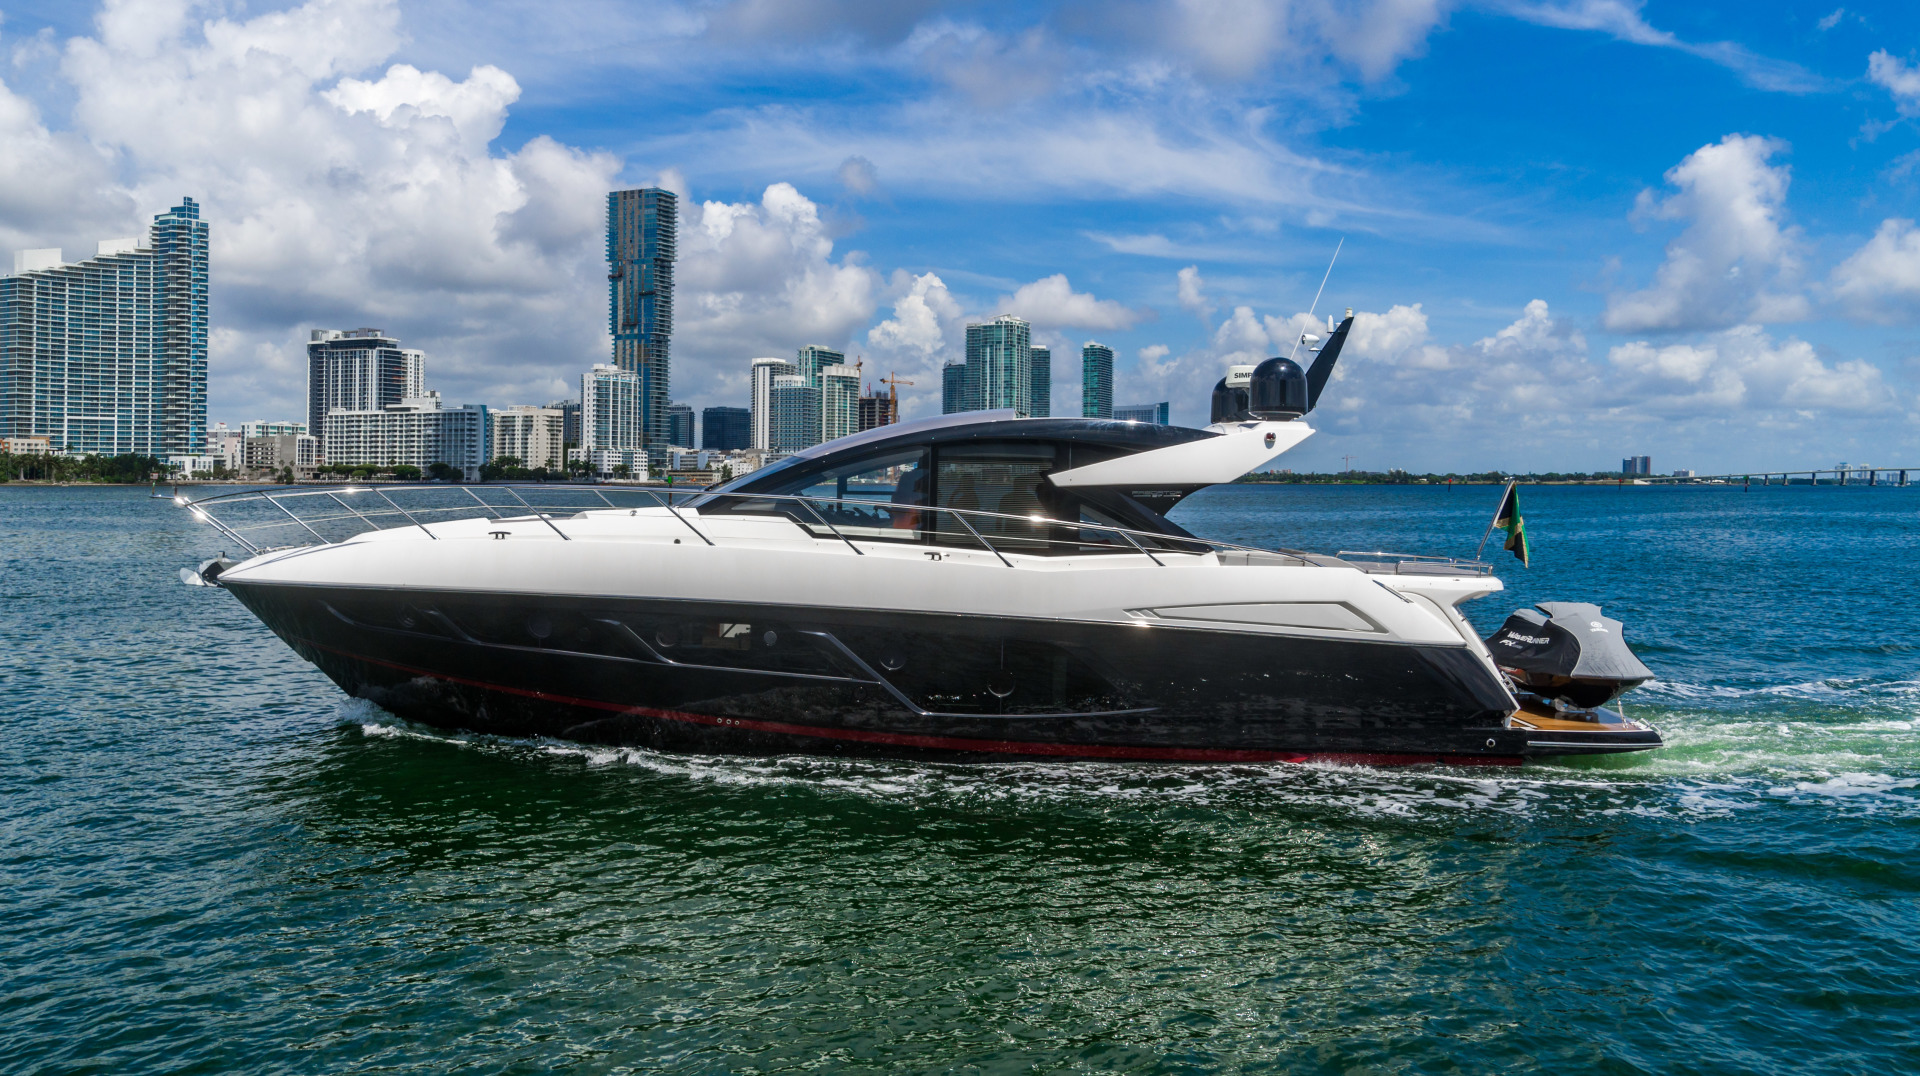 Sunseeker-Predator 2019 -Miami Beach-Florida-United States-1475703 | Thumbnail